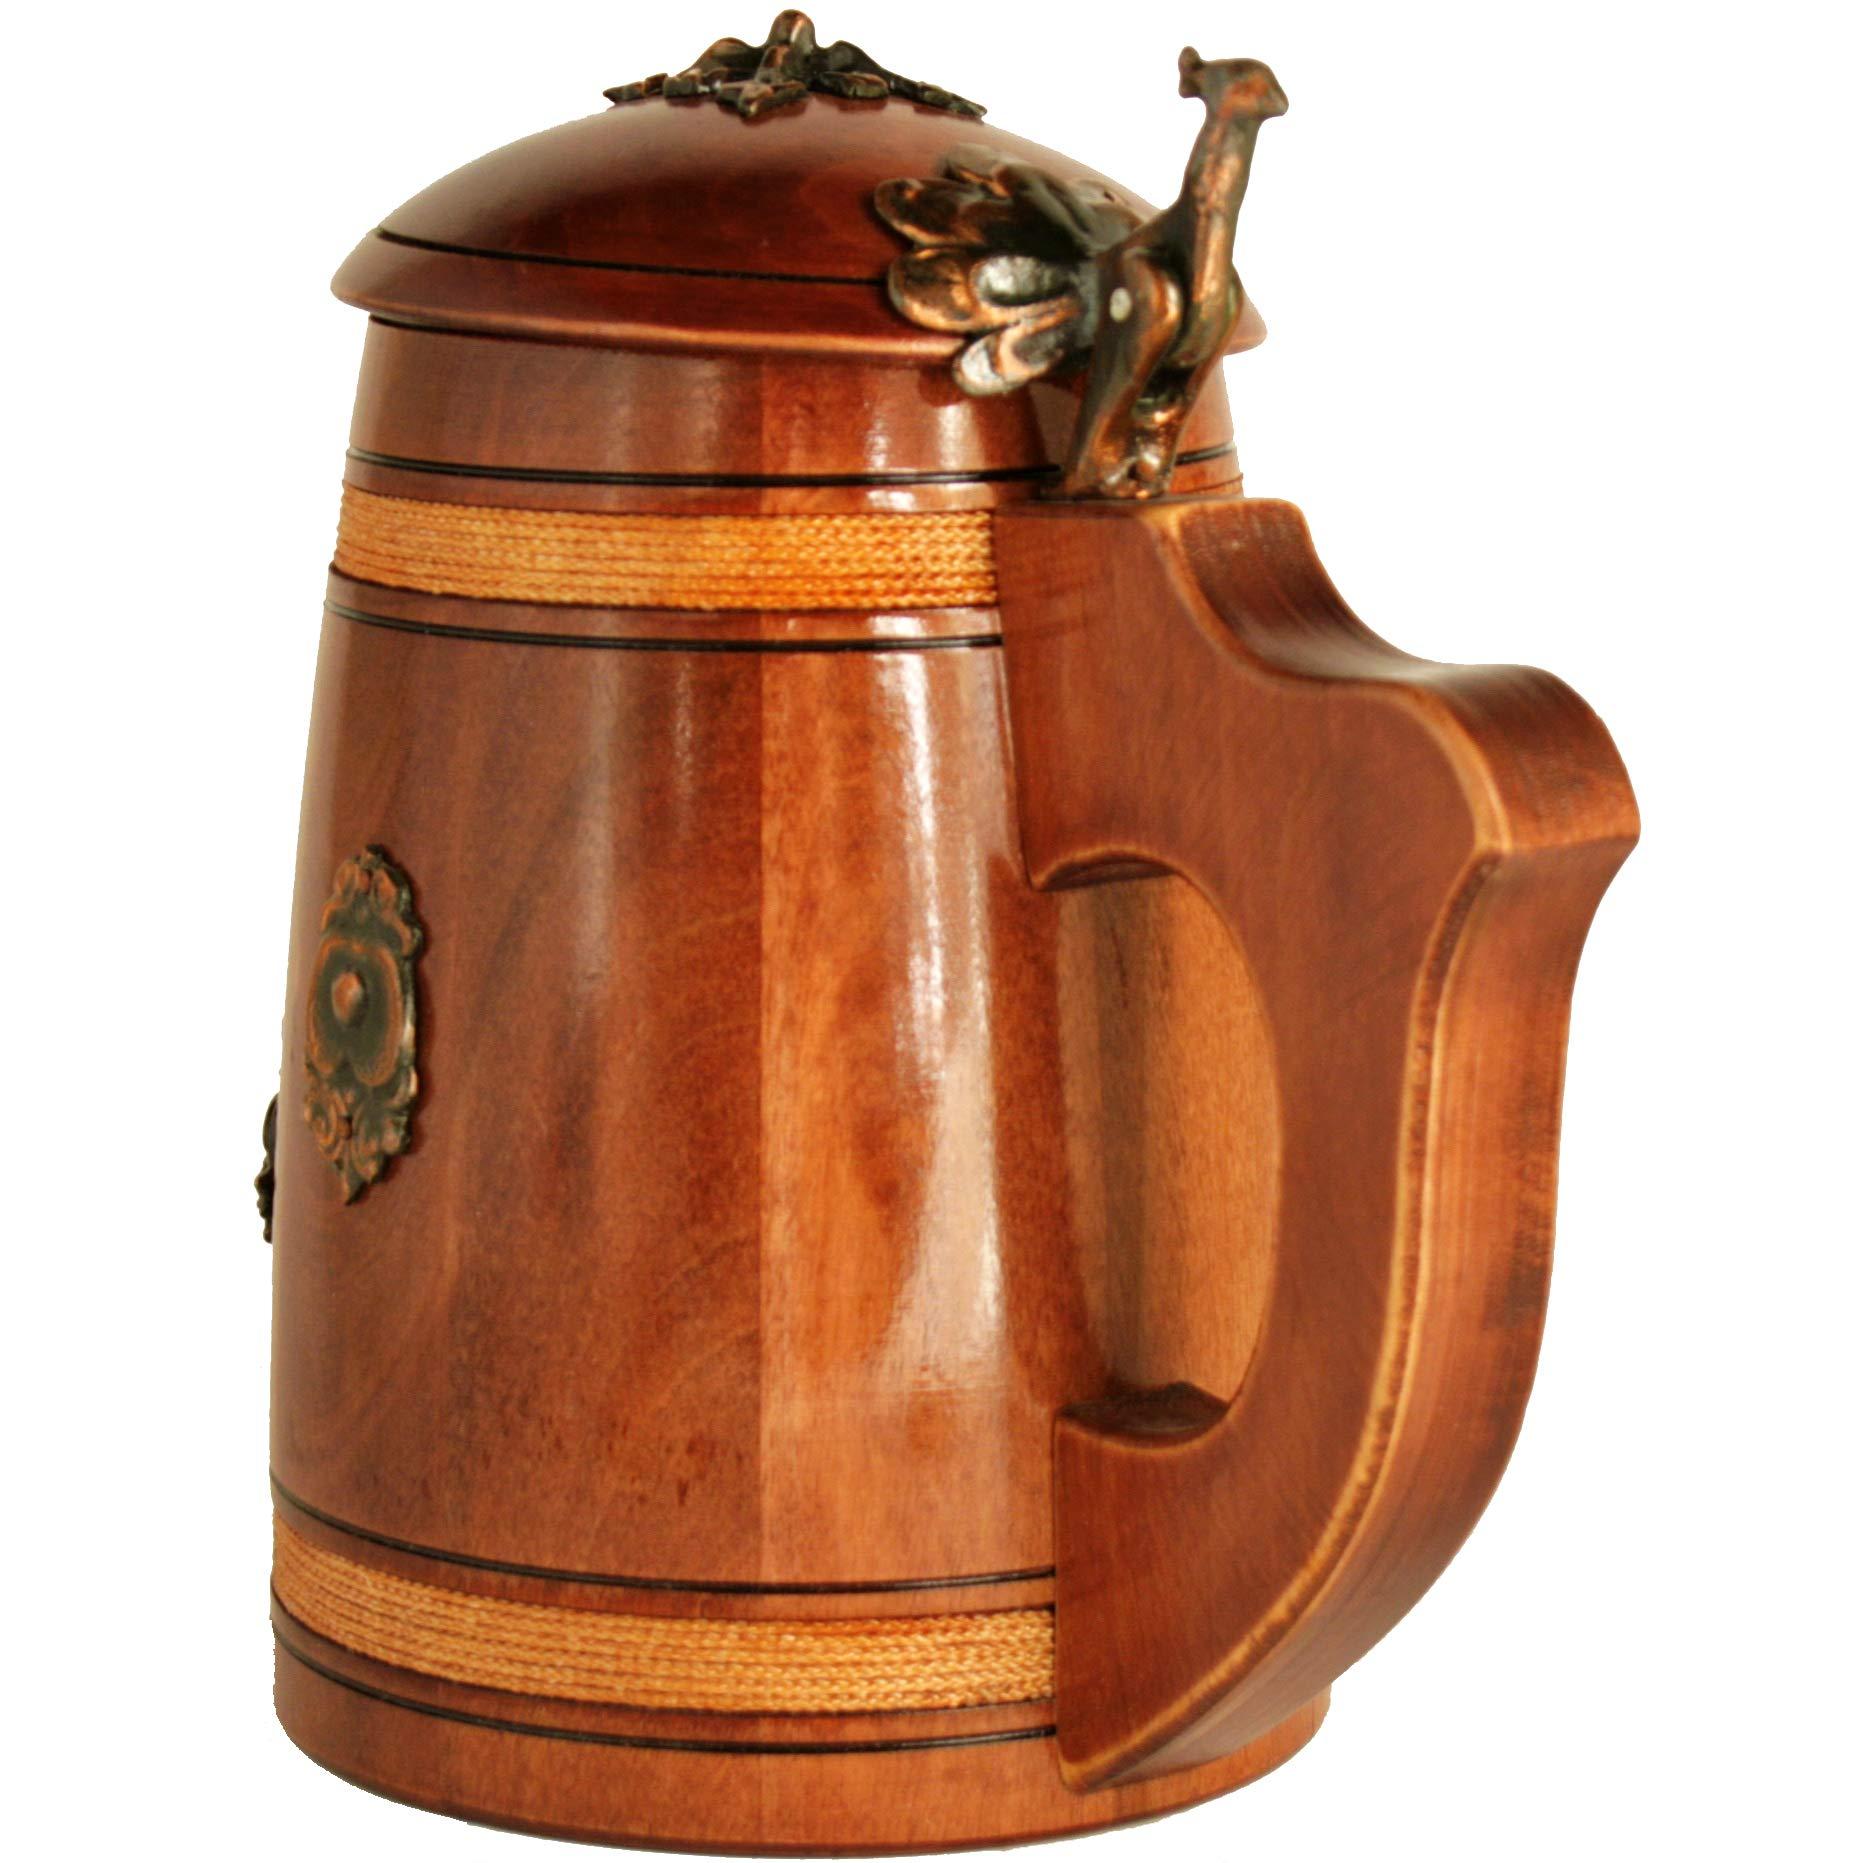 Oak Barrel Mug Half Liter In 2019 Wish List Wood Mug Wooden